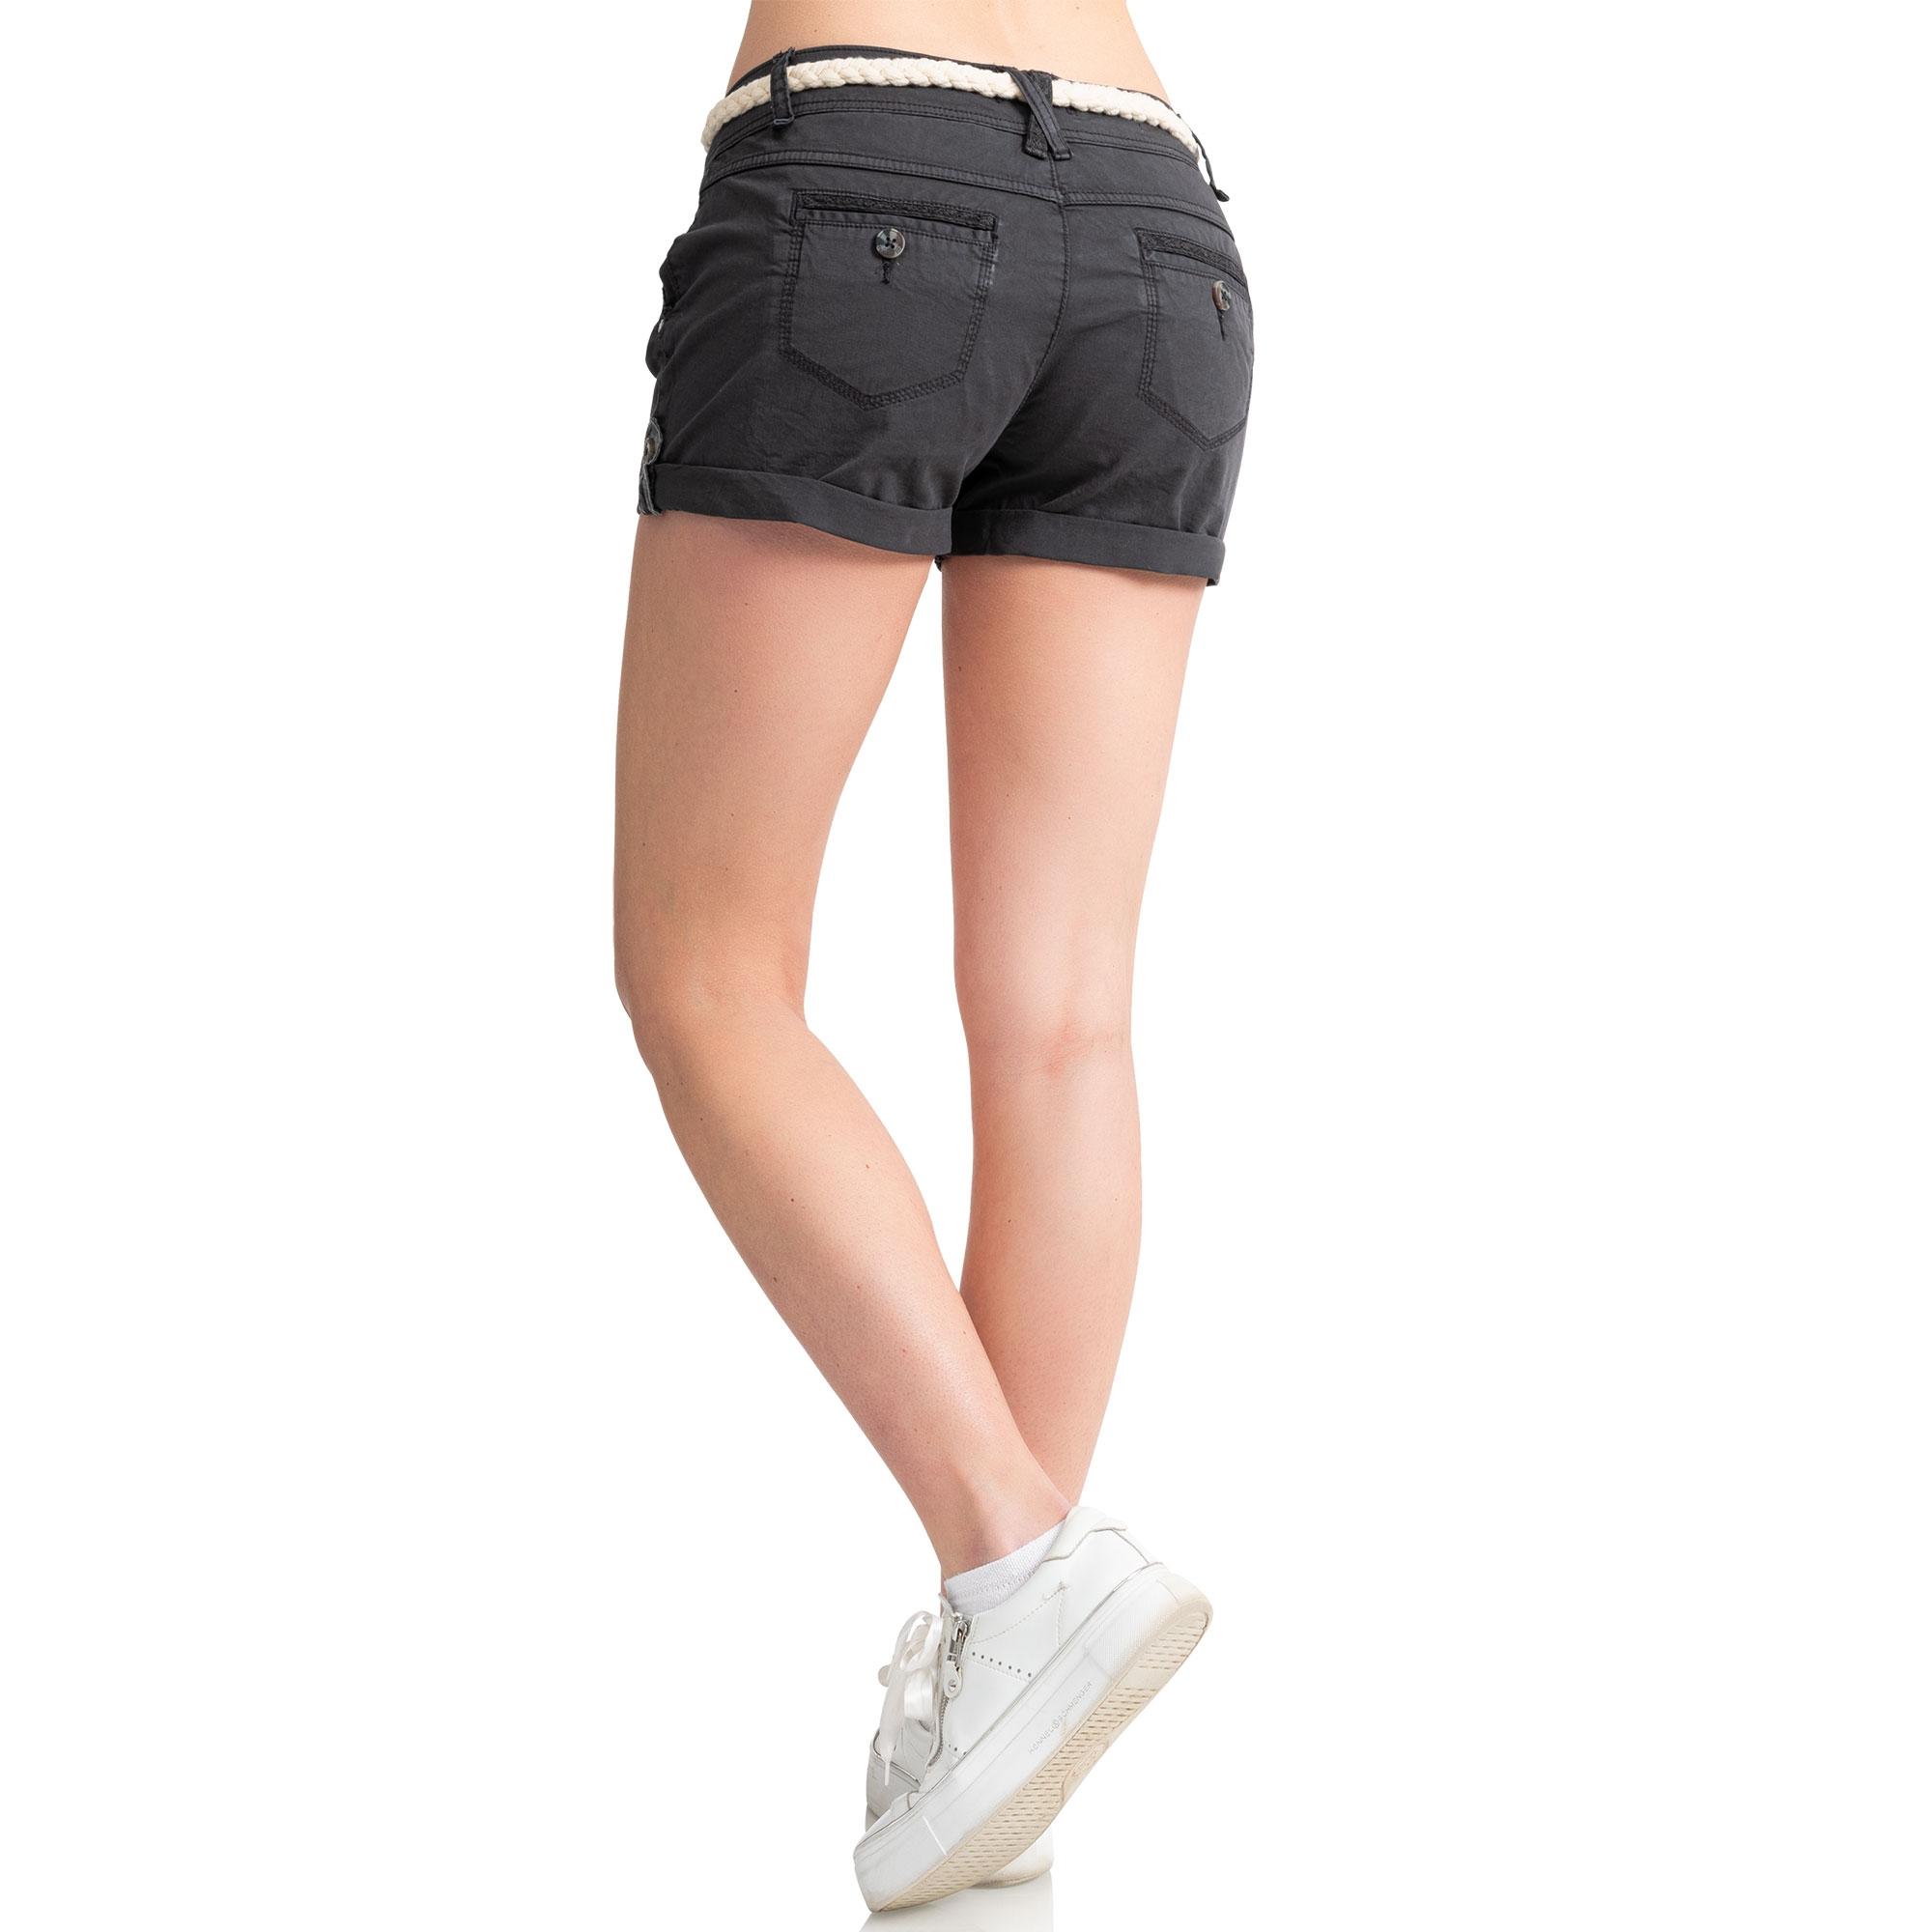 Indexbild 3 - Eight2Nine Damen Chino Bermuda Stretch Shorts mit Flecht Gürtel Hotpants